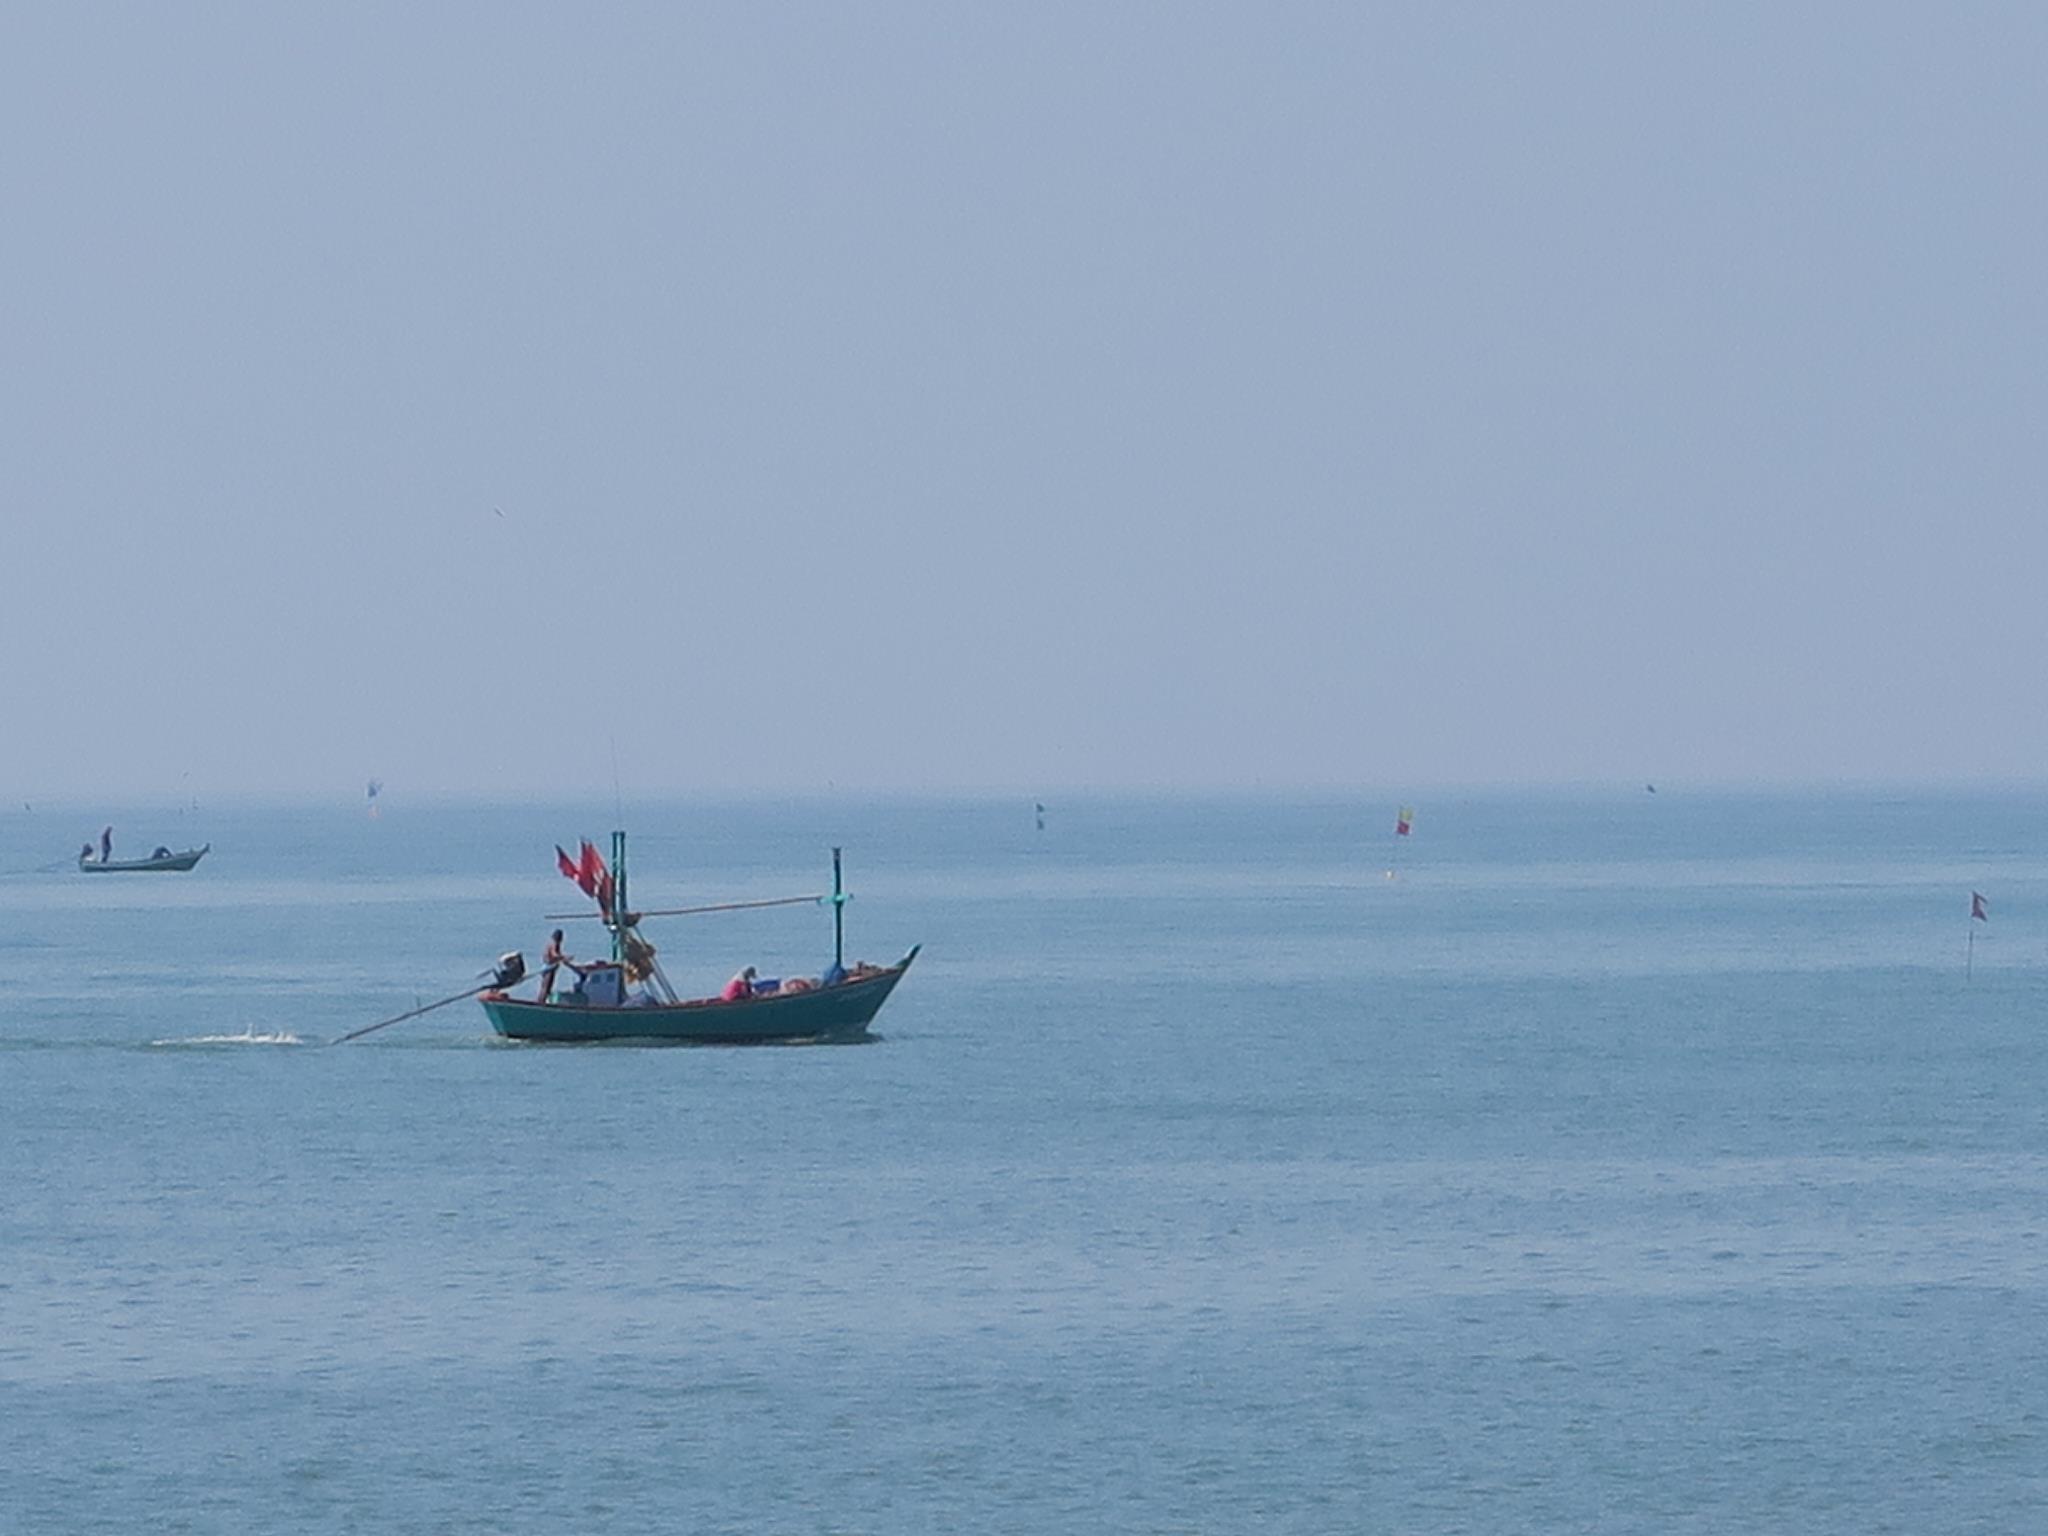 CHOMTALAY RESORT Hadchao samran,ชมทะเลรีสอร์ท หาดเจ้าสำราญ